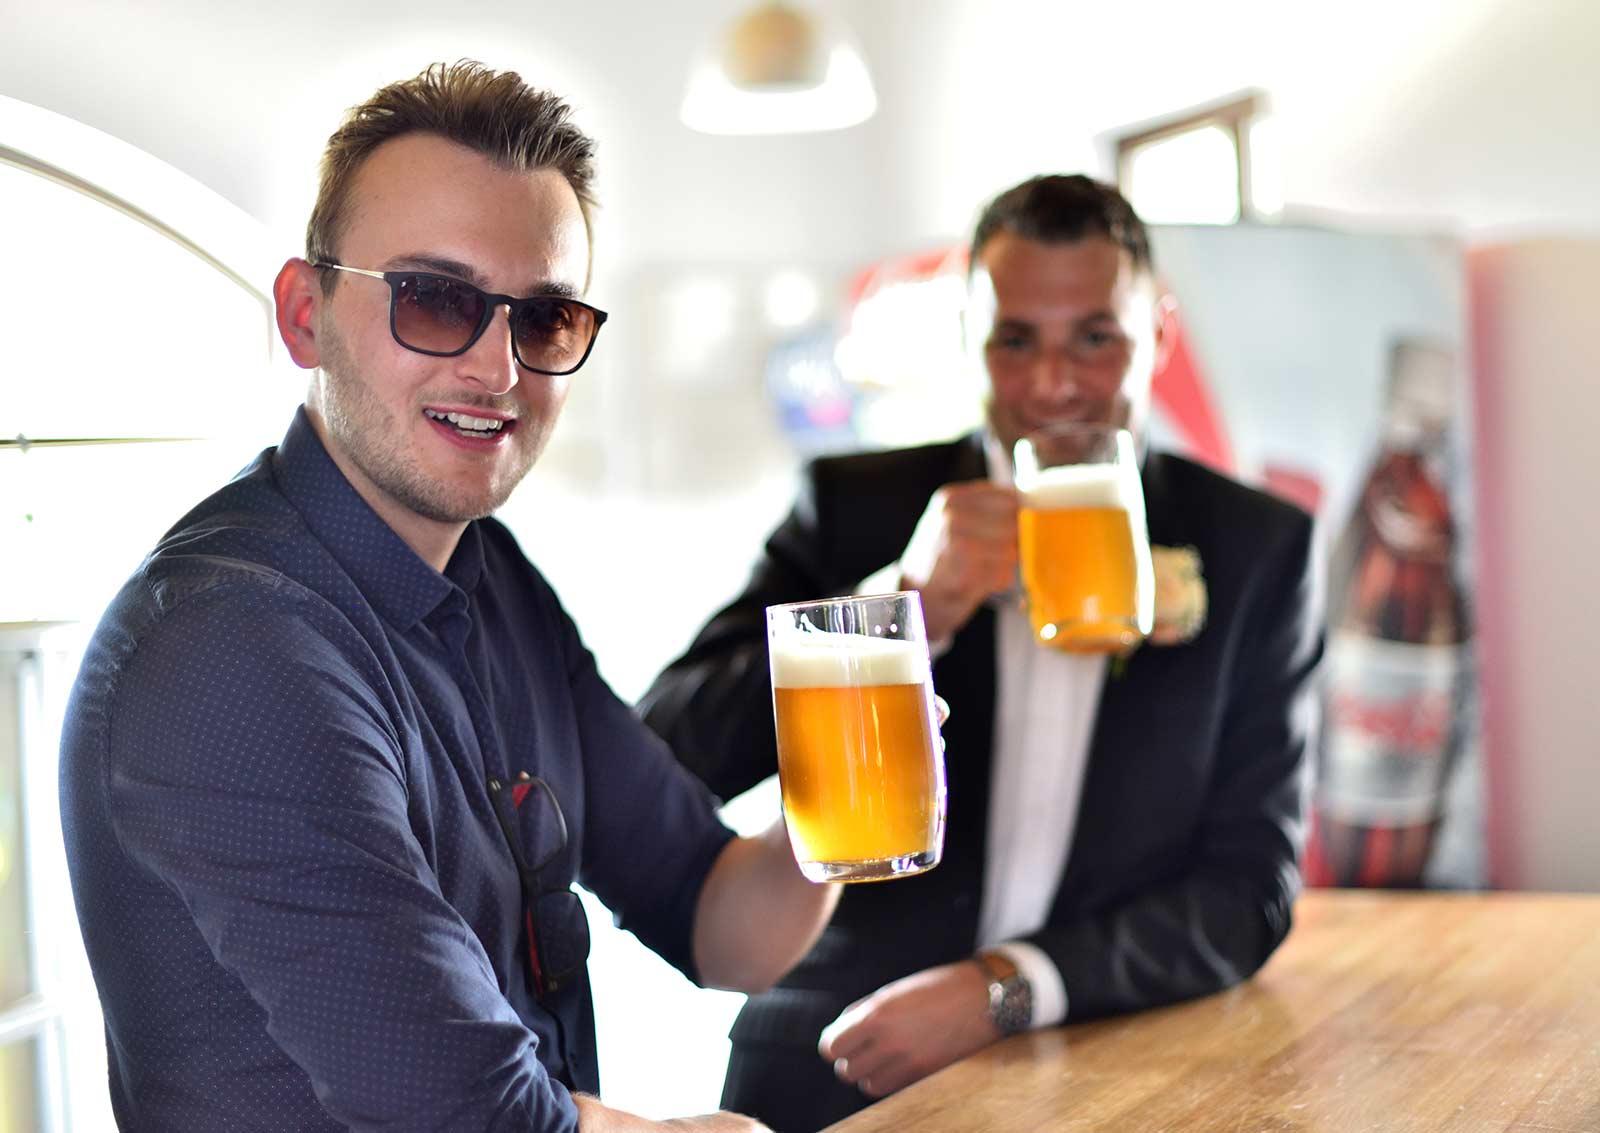 45 svatebni hostina a pripitek pivovar svatebni fotograf ales motejl jihocesky kraj